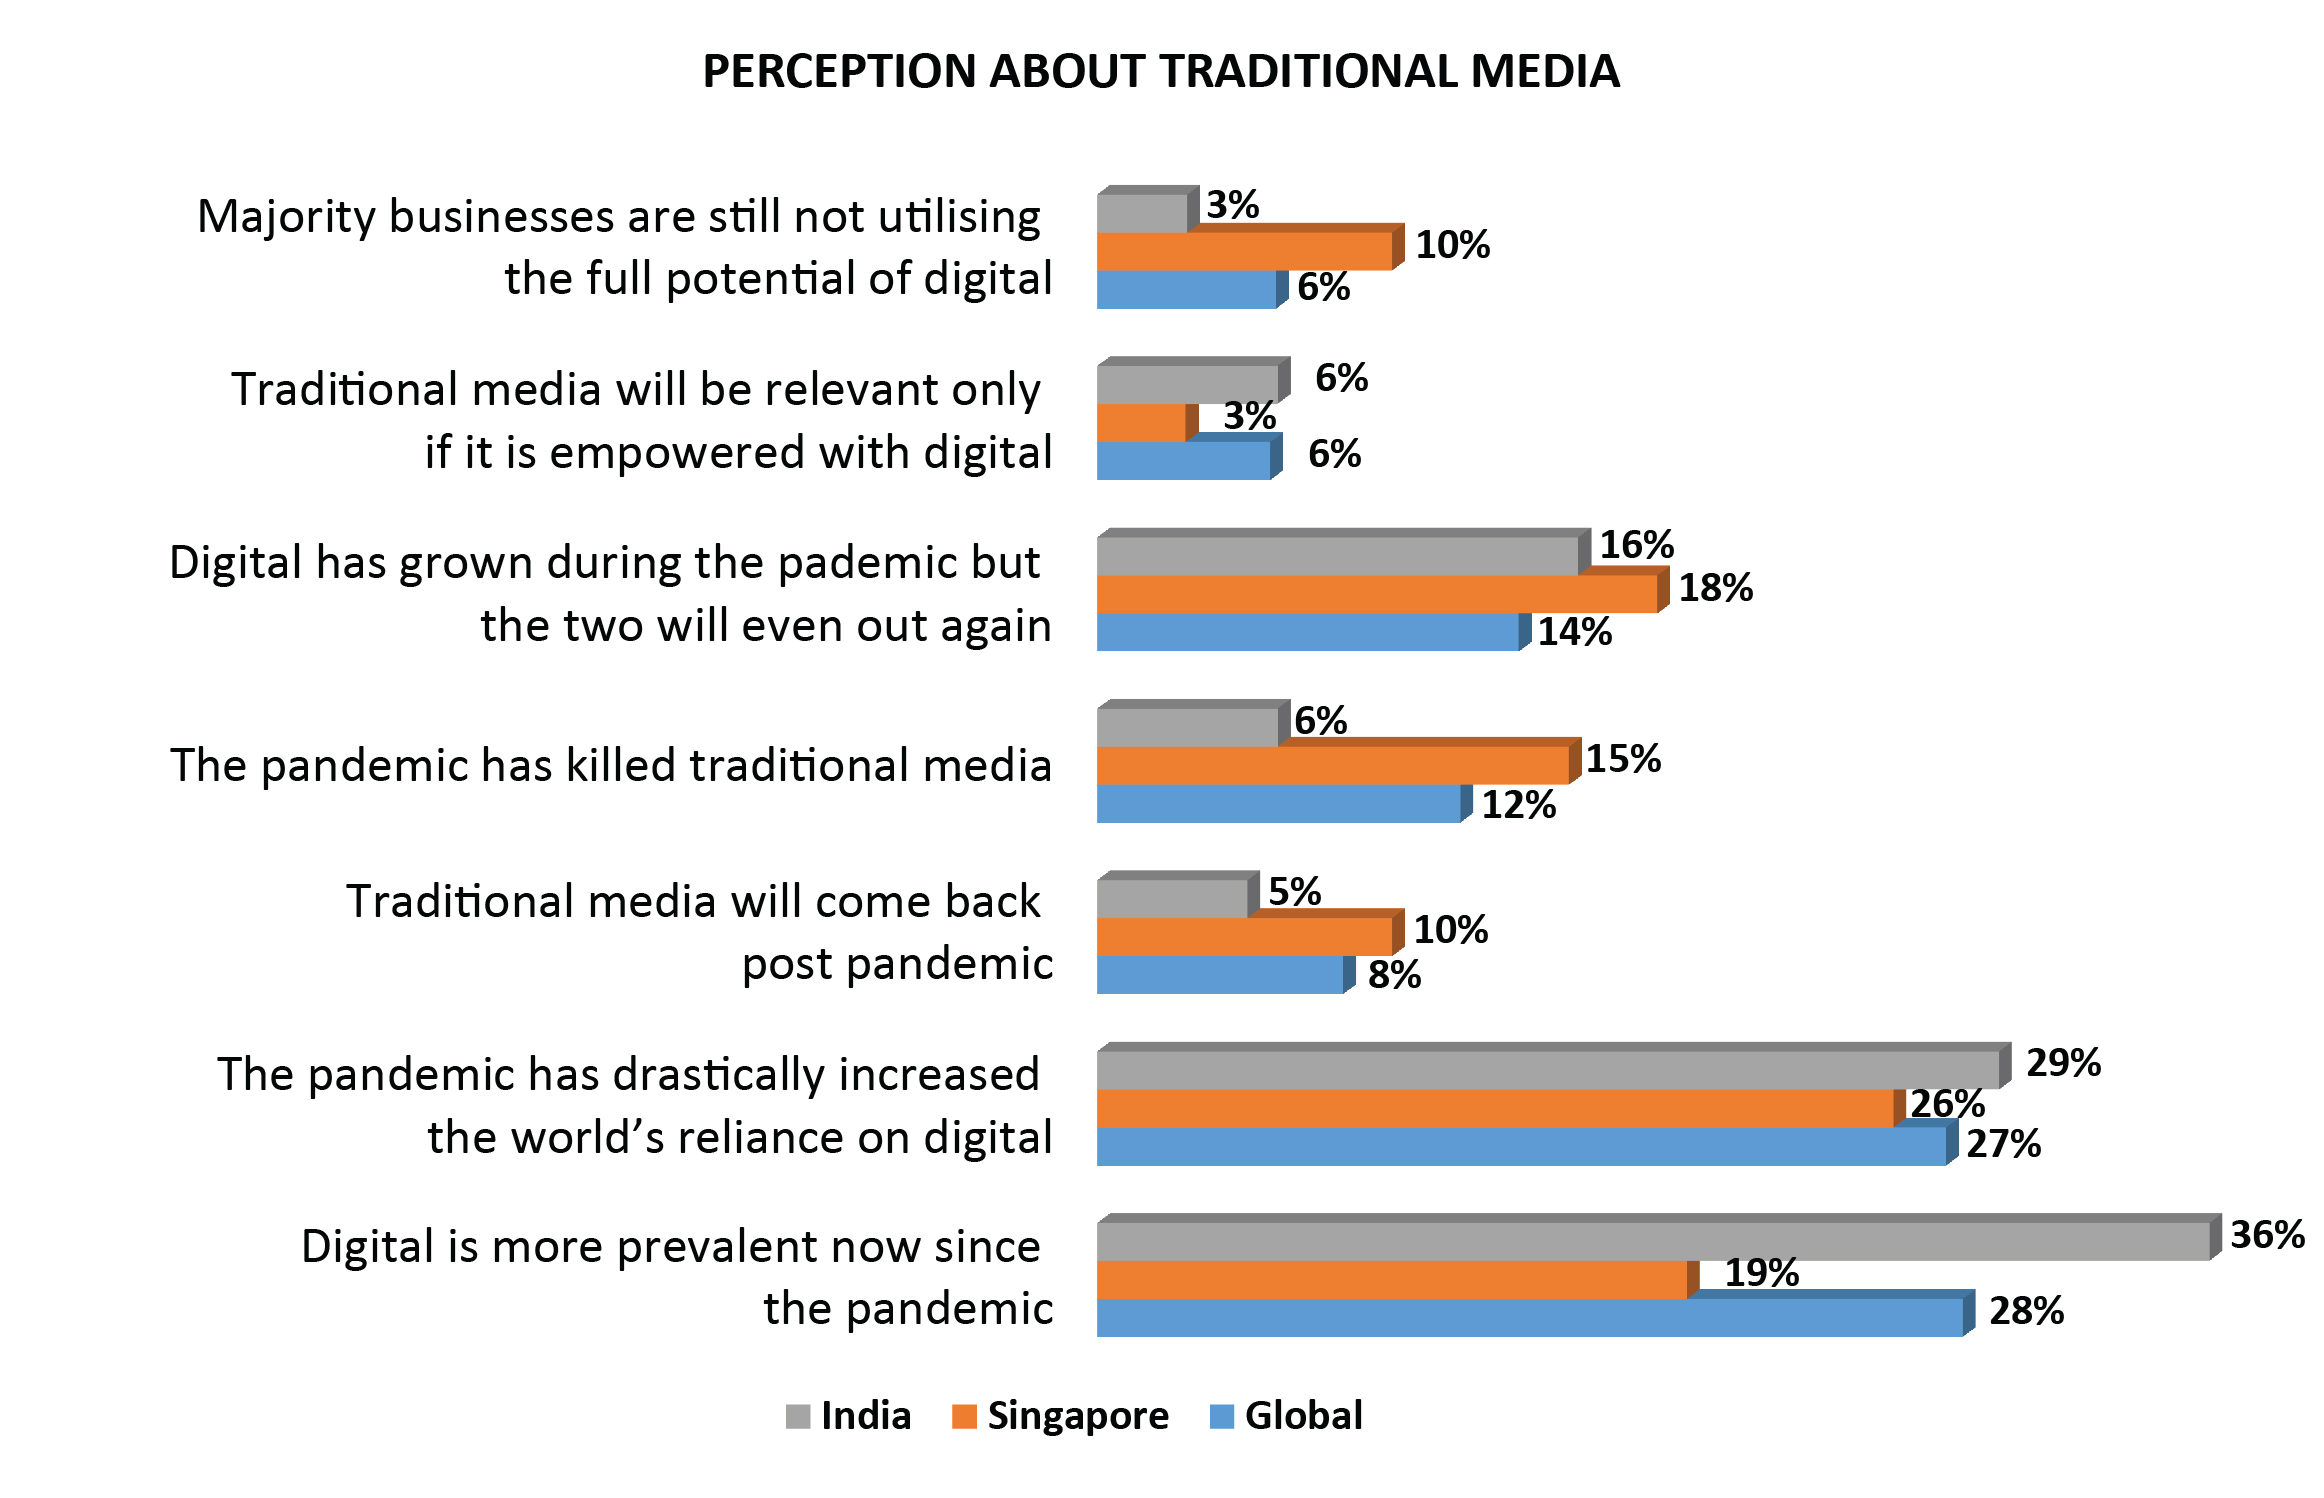 Traditional media perception